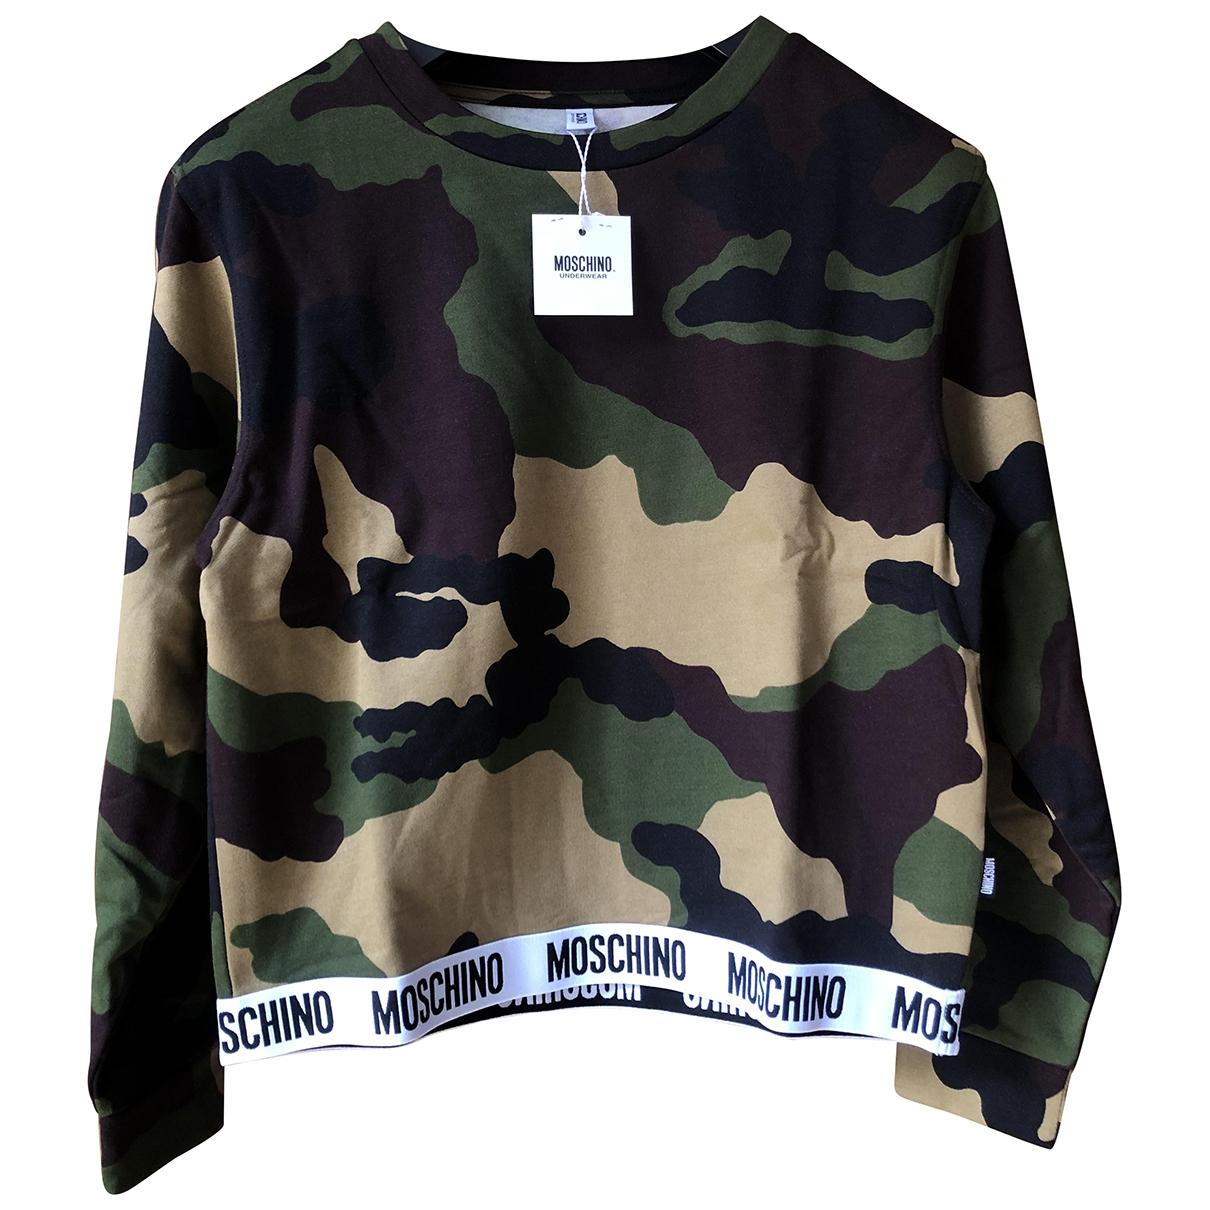 Moschino \N Cotton Knitwear for Women S International